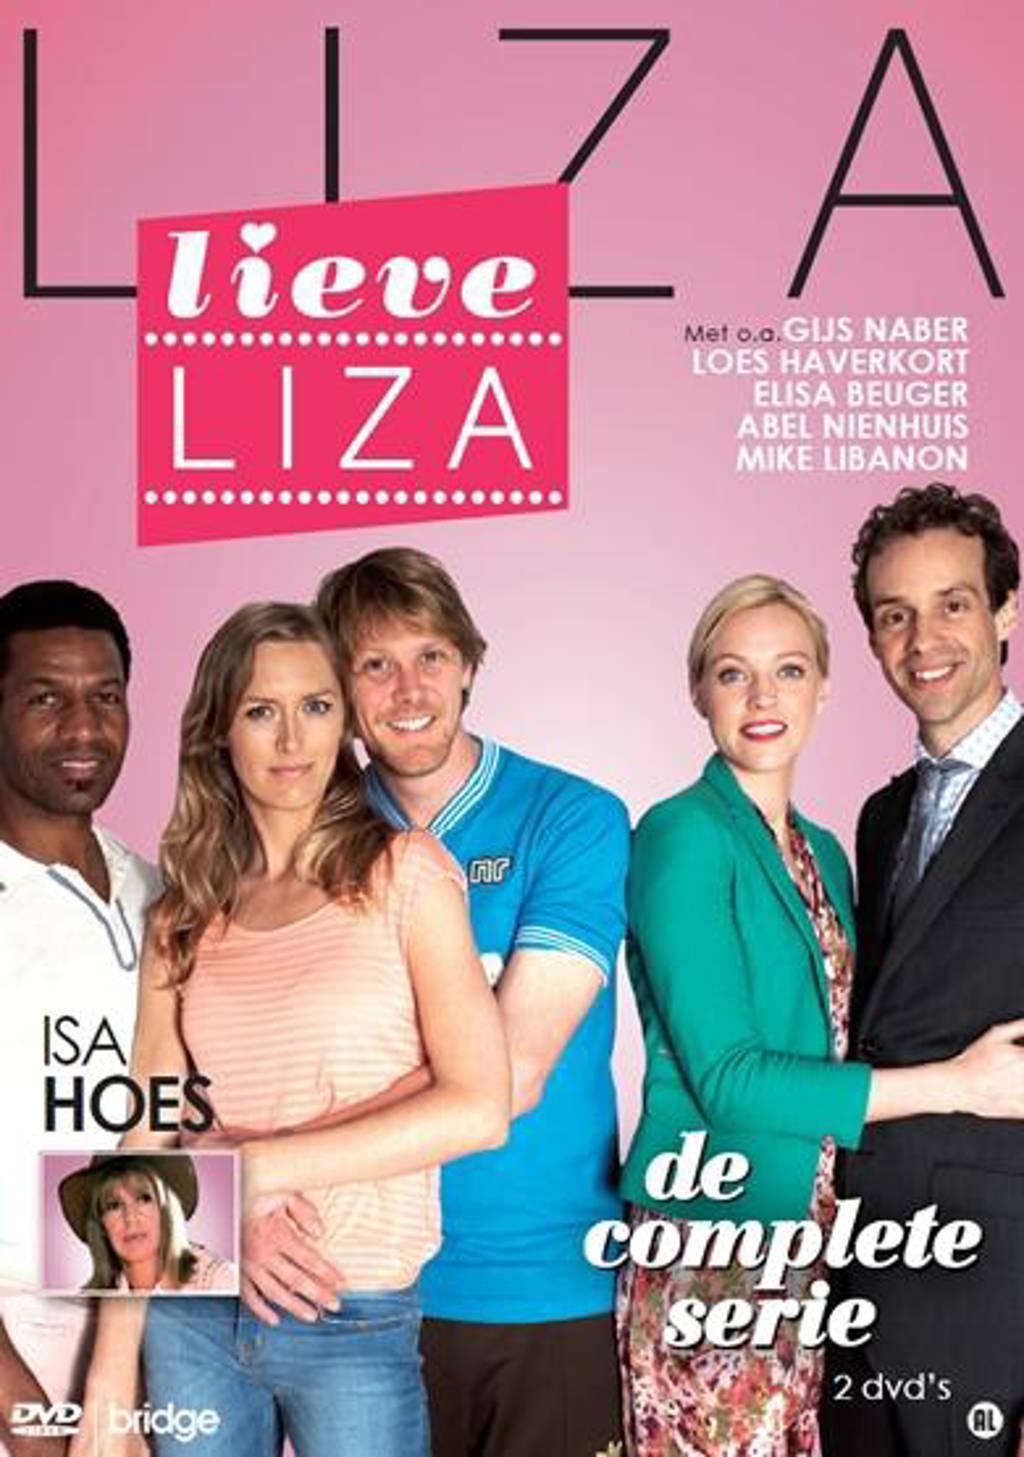 Lieve Liza - Complete serie (DVD)